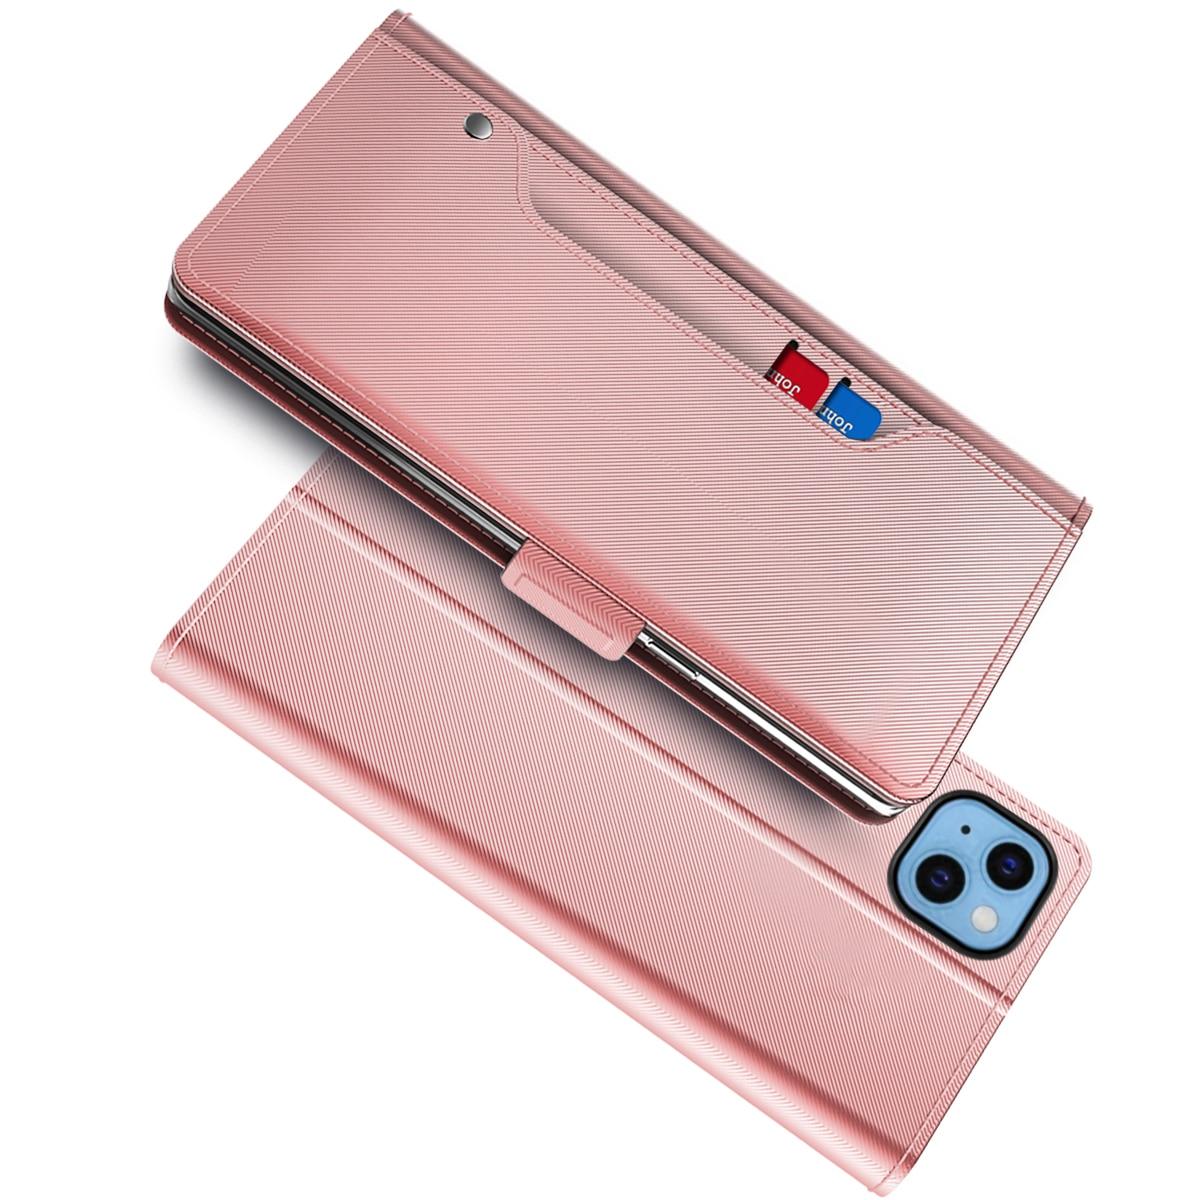 Plånboksfodral Spegel iPhone 13 rosa guld